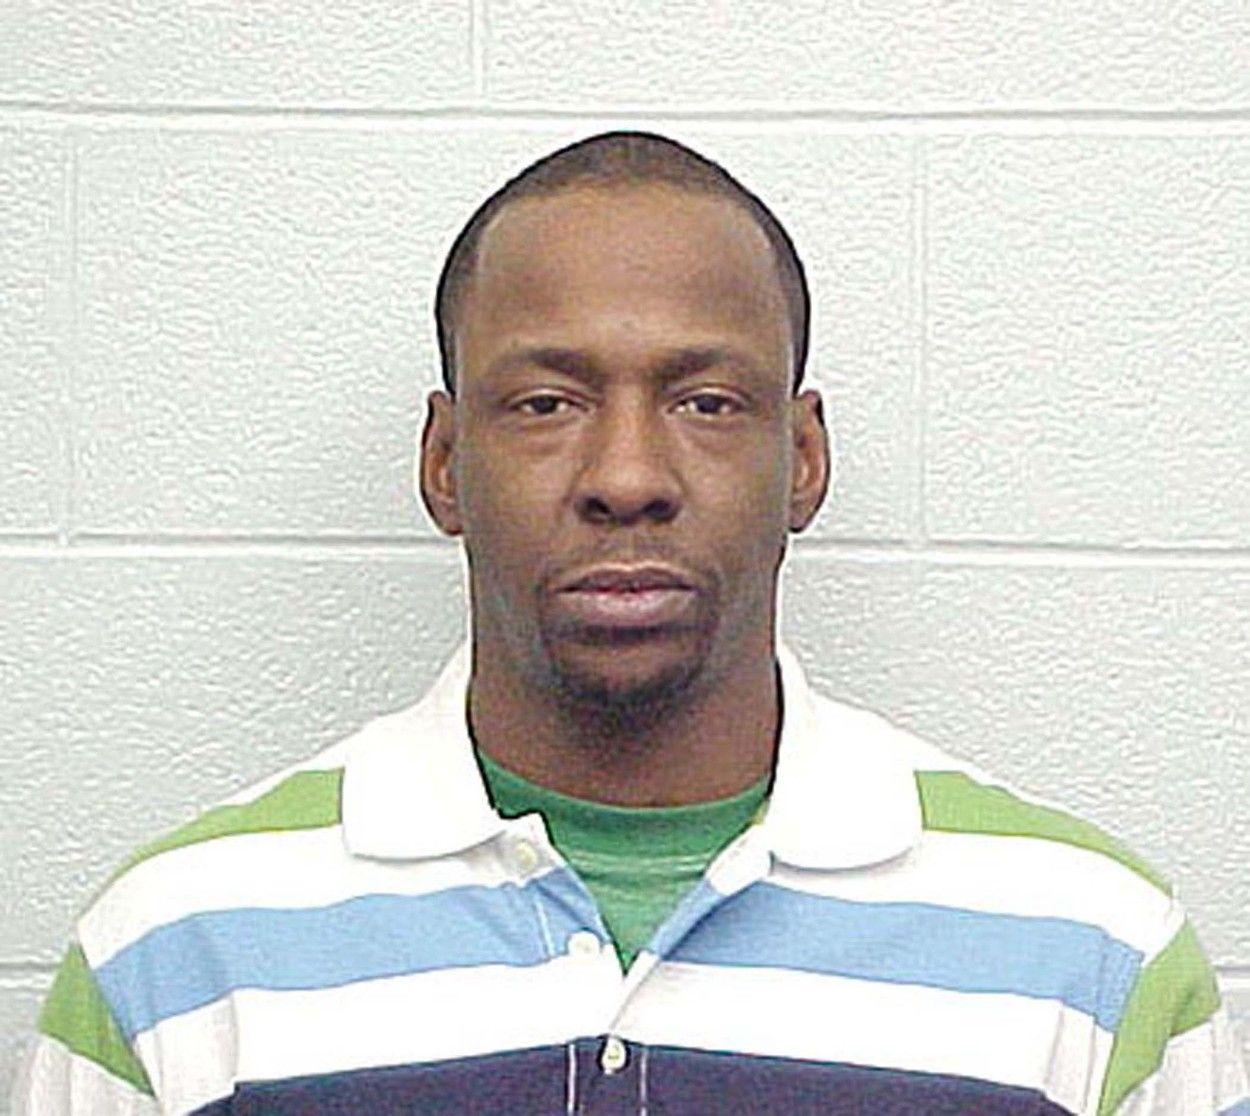 Bobby Brown börtönben